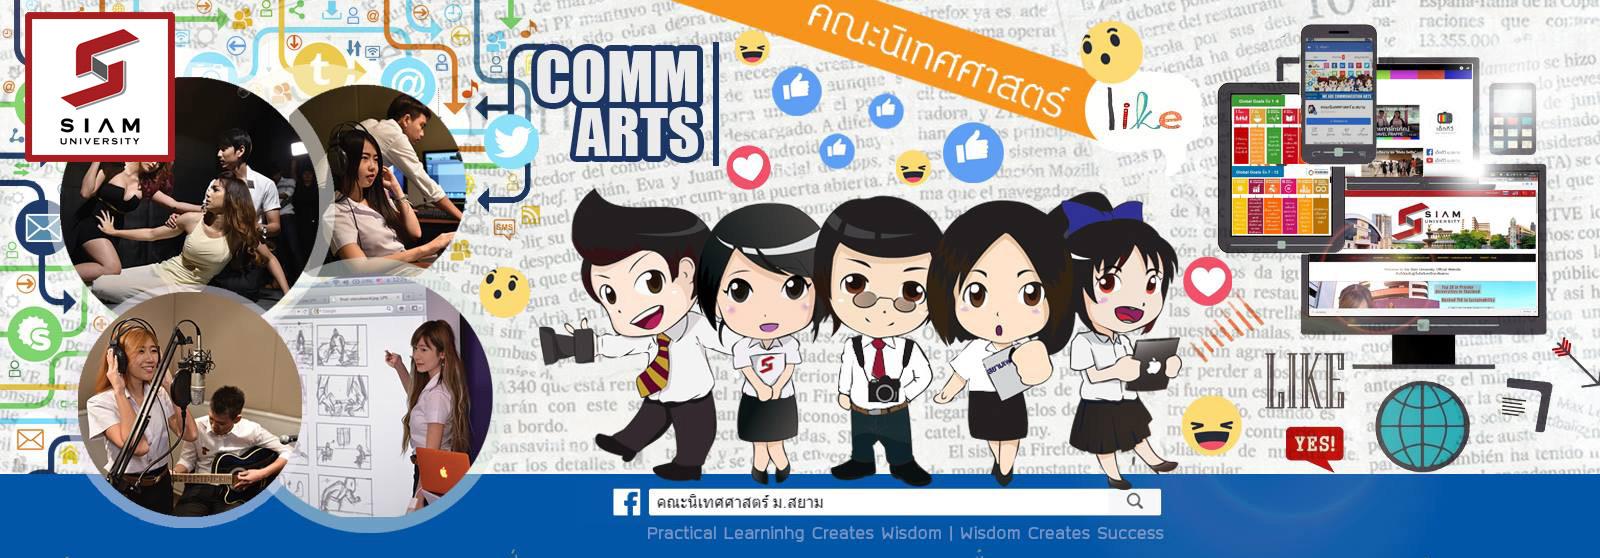 CA Alumni News - นิเทศศาสตร์